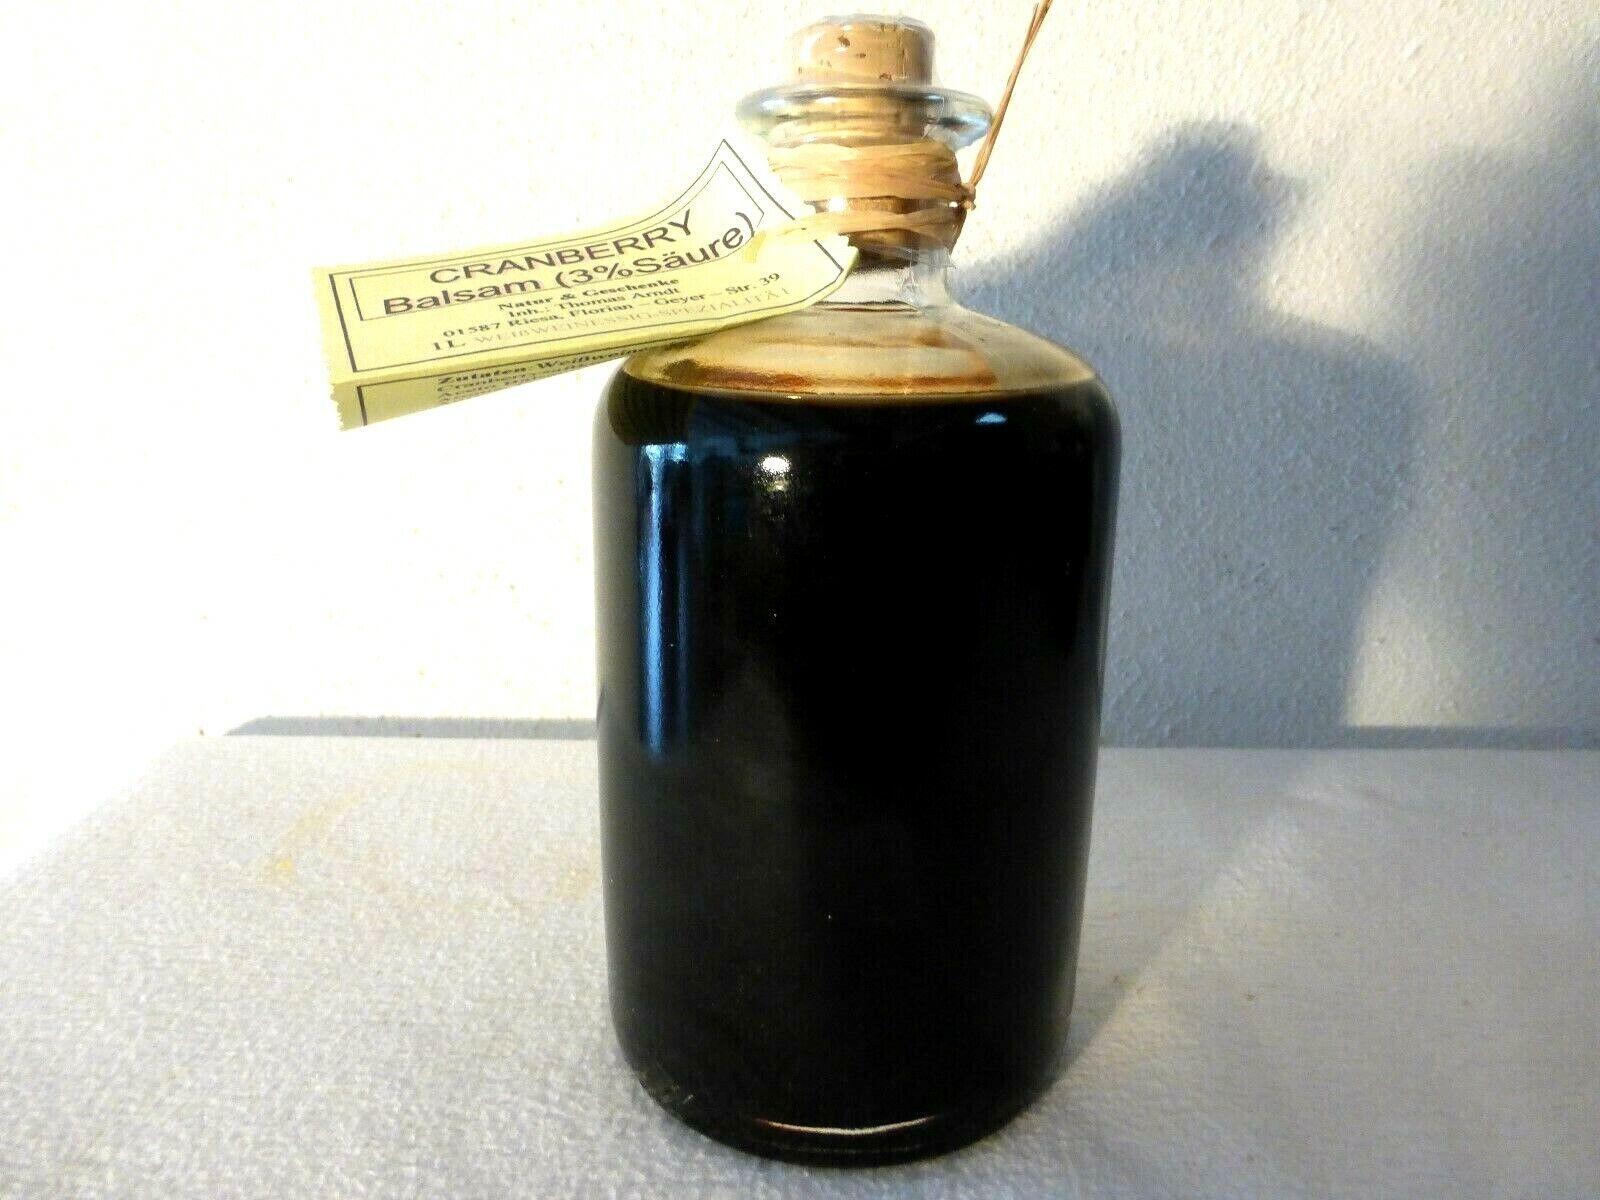 Cranberry Balsam Crema - 1L-3% Säure - dickflüssig, fruchtig m. Aceto Balsamico!